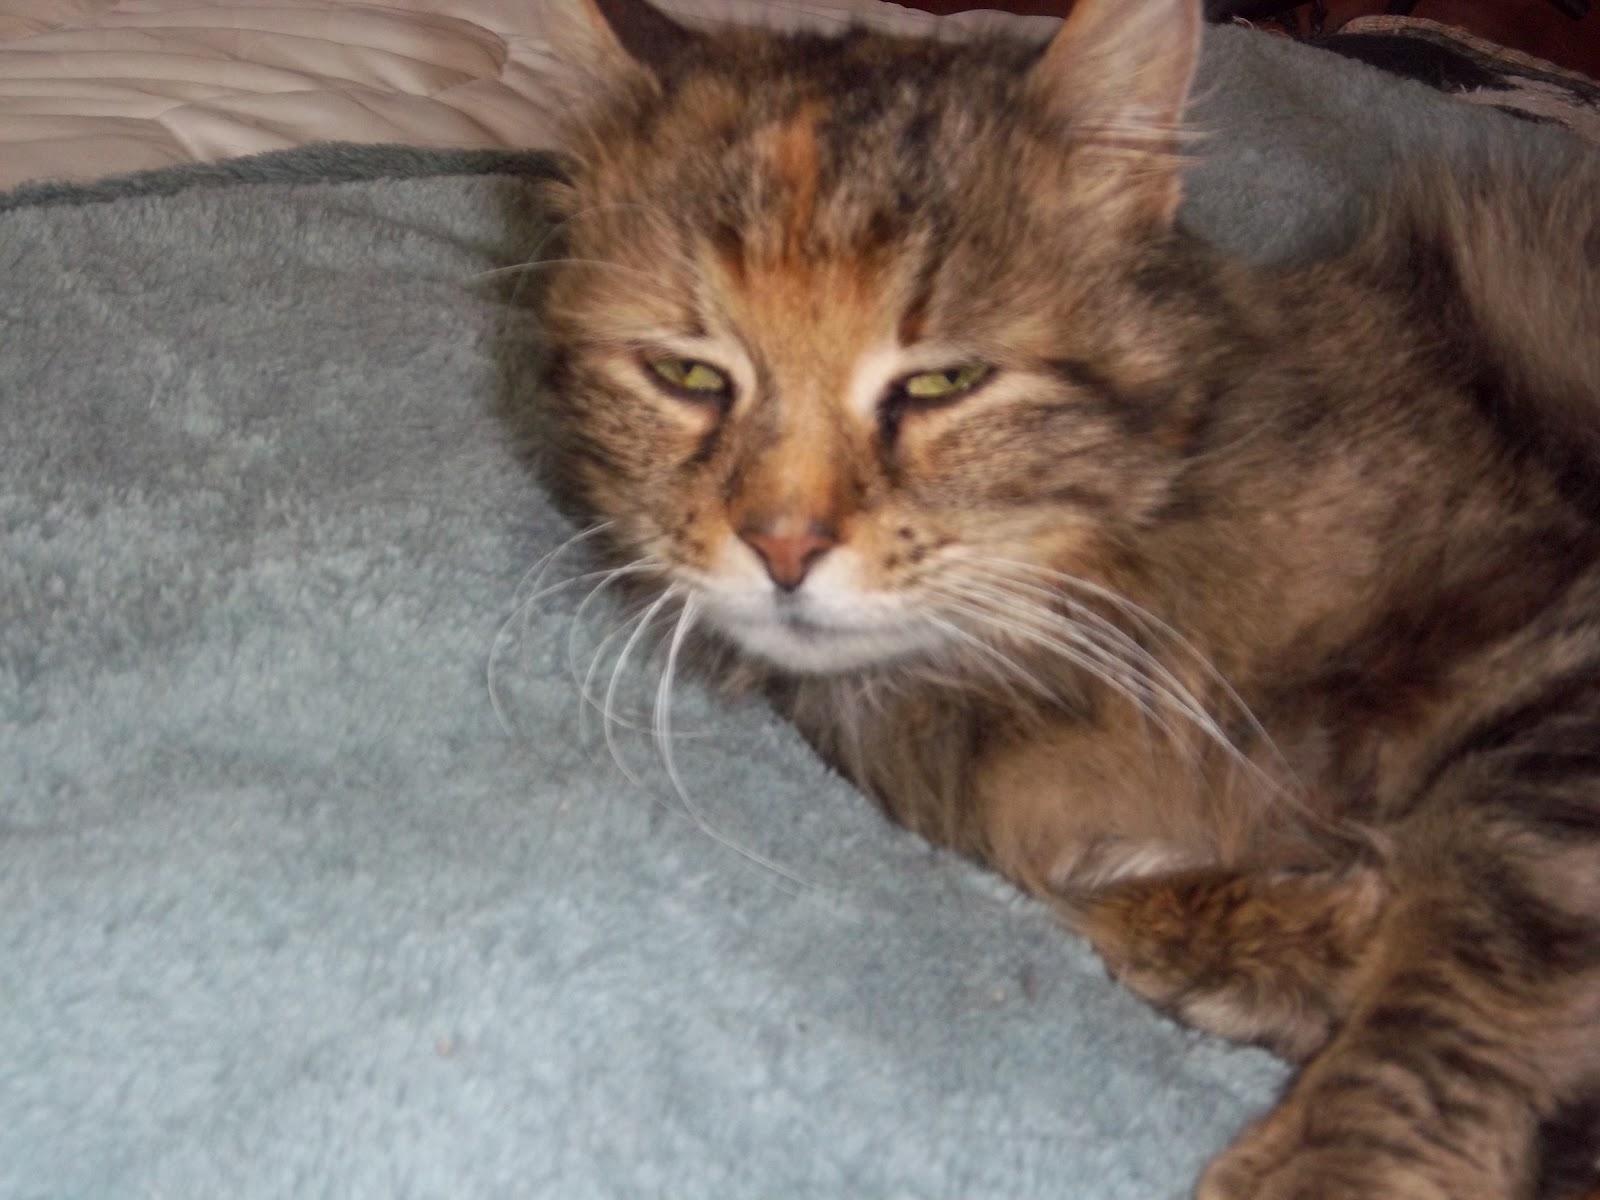 Sad Wet Kitten I get sad watching her